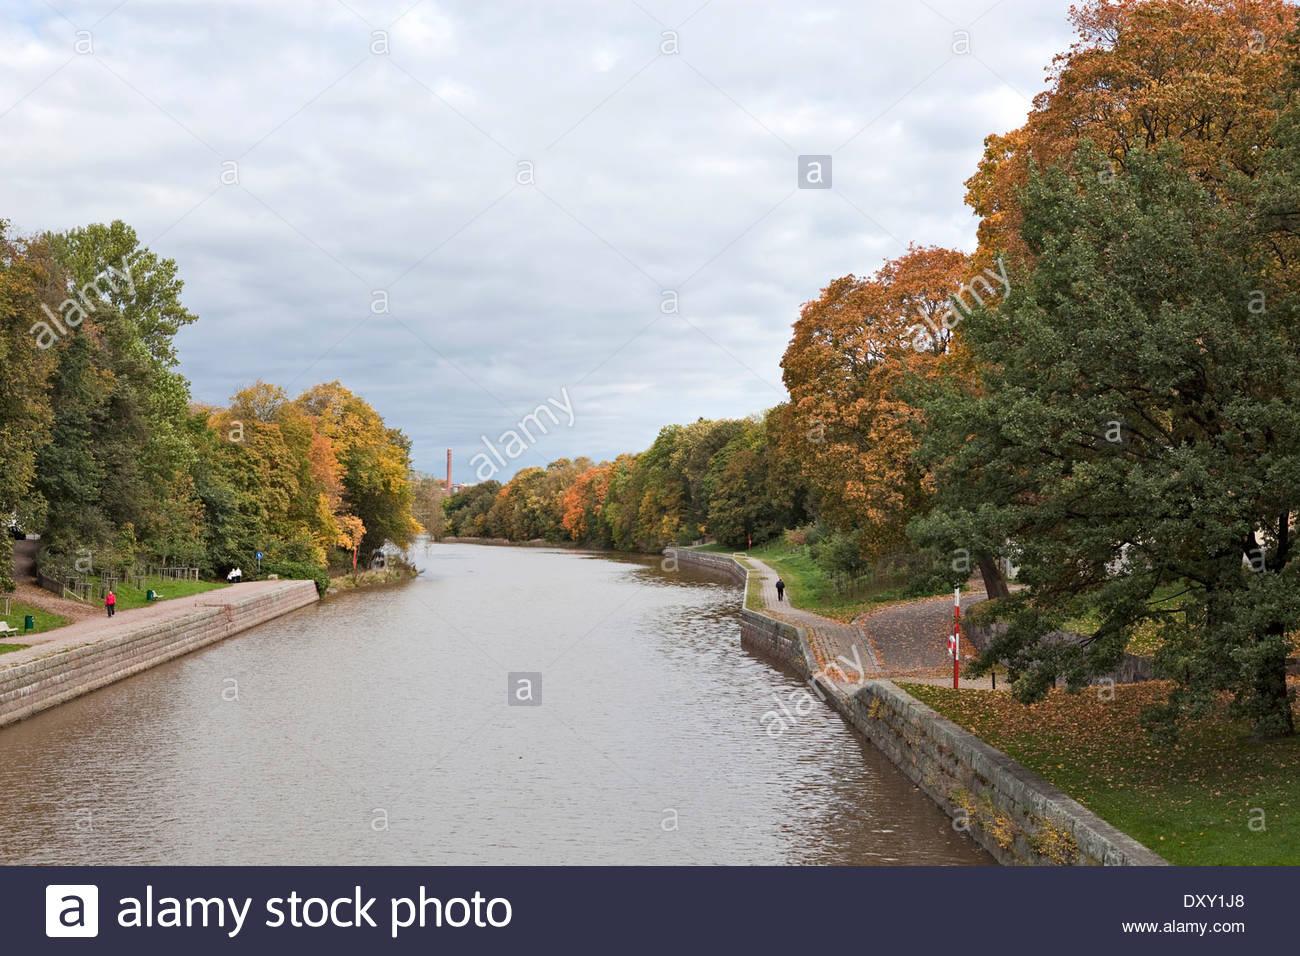 River Aura in autumn - Stock Image